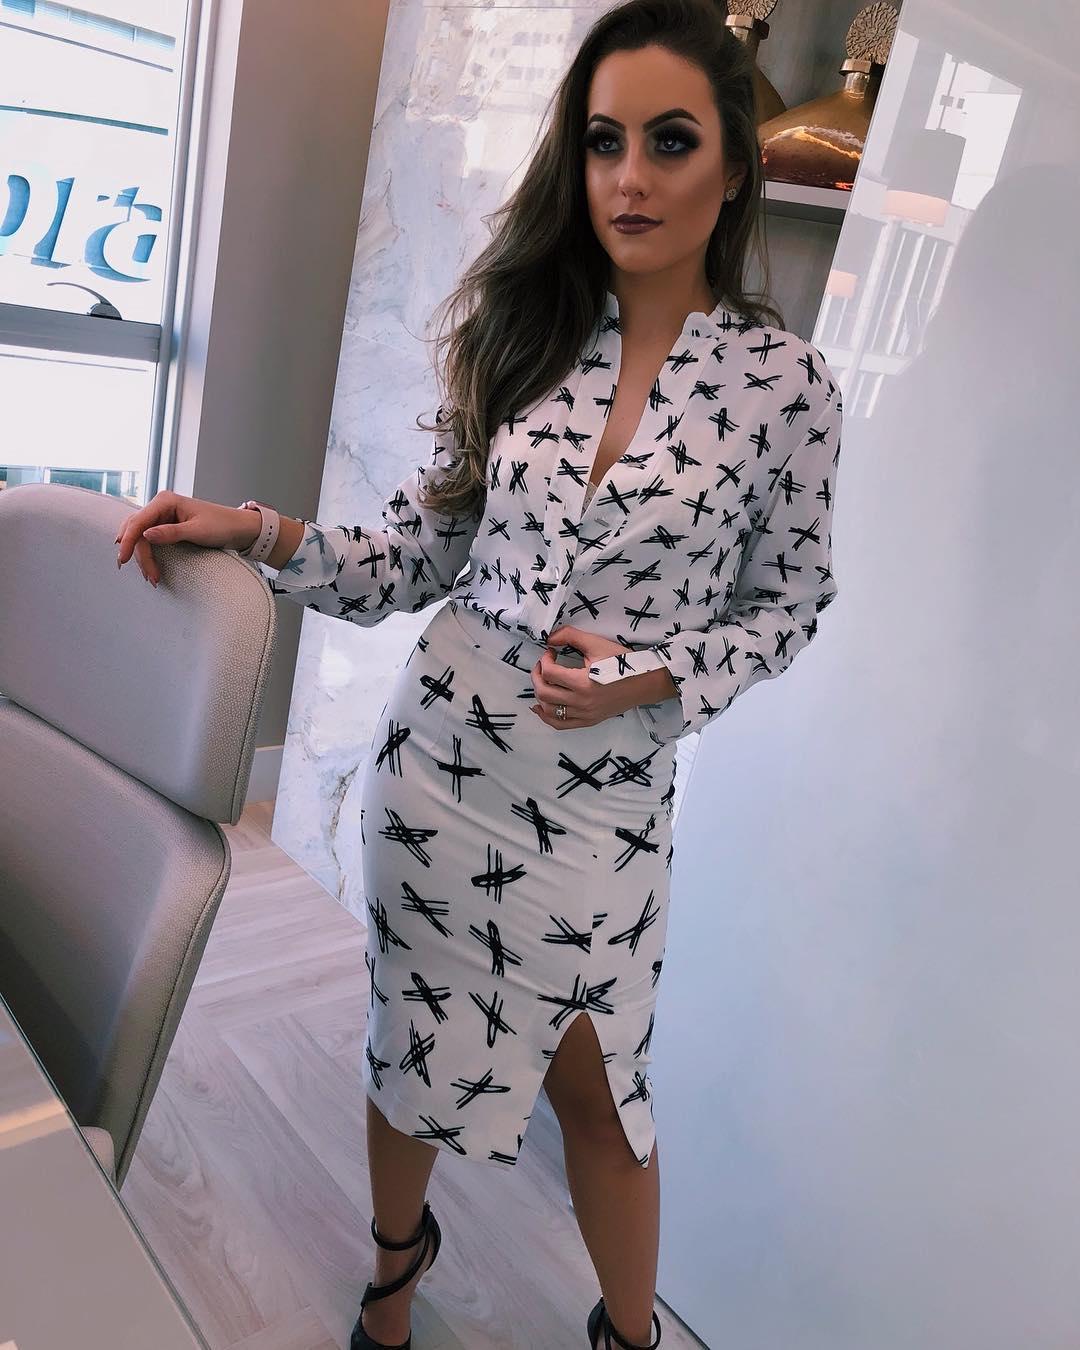 cristine boff sartor, segunda finalista de miss latinoamerica 2019. - Página 4 41466510